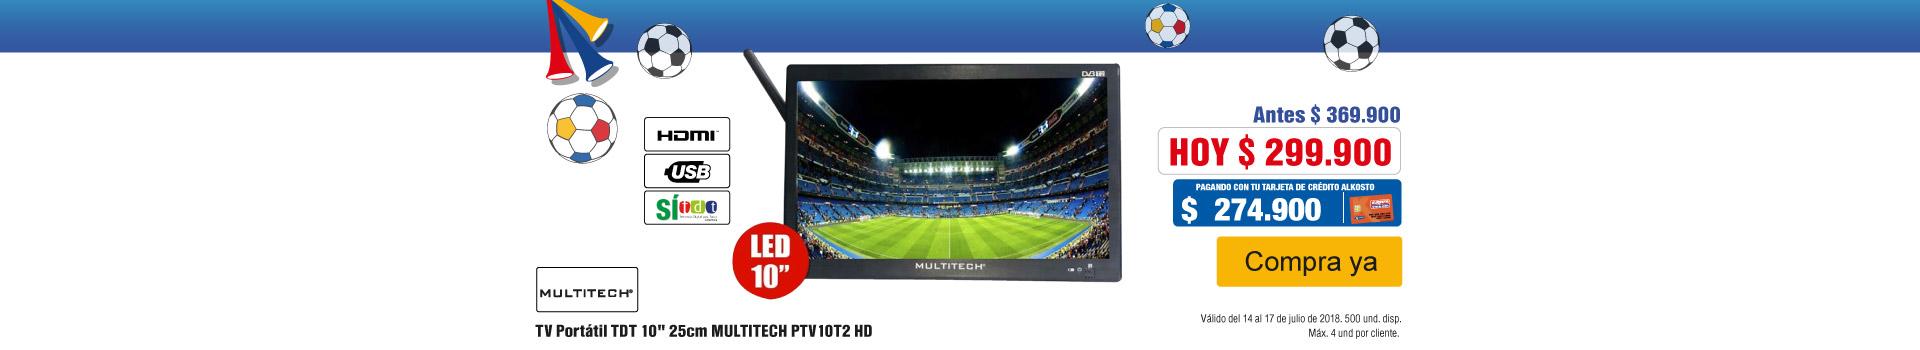 AK-KT-HIPER-1-TV-PP---Multitech-PTV10T2-Jul13